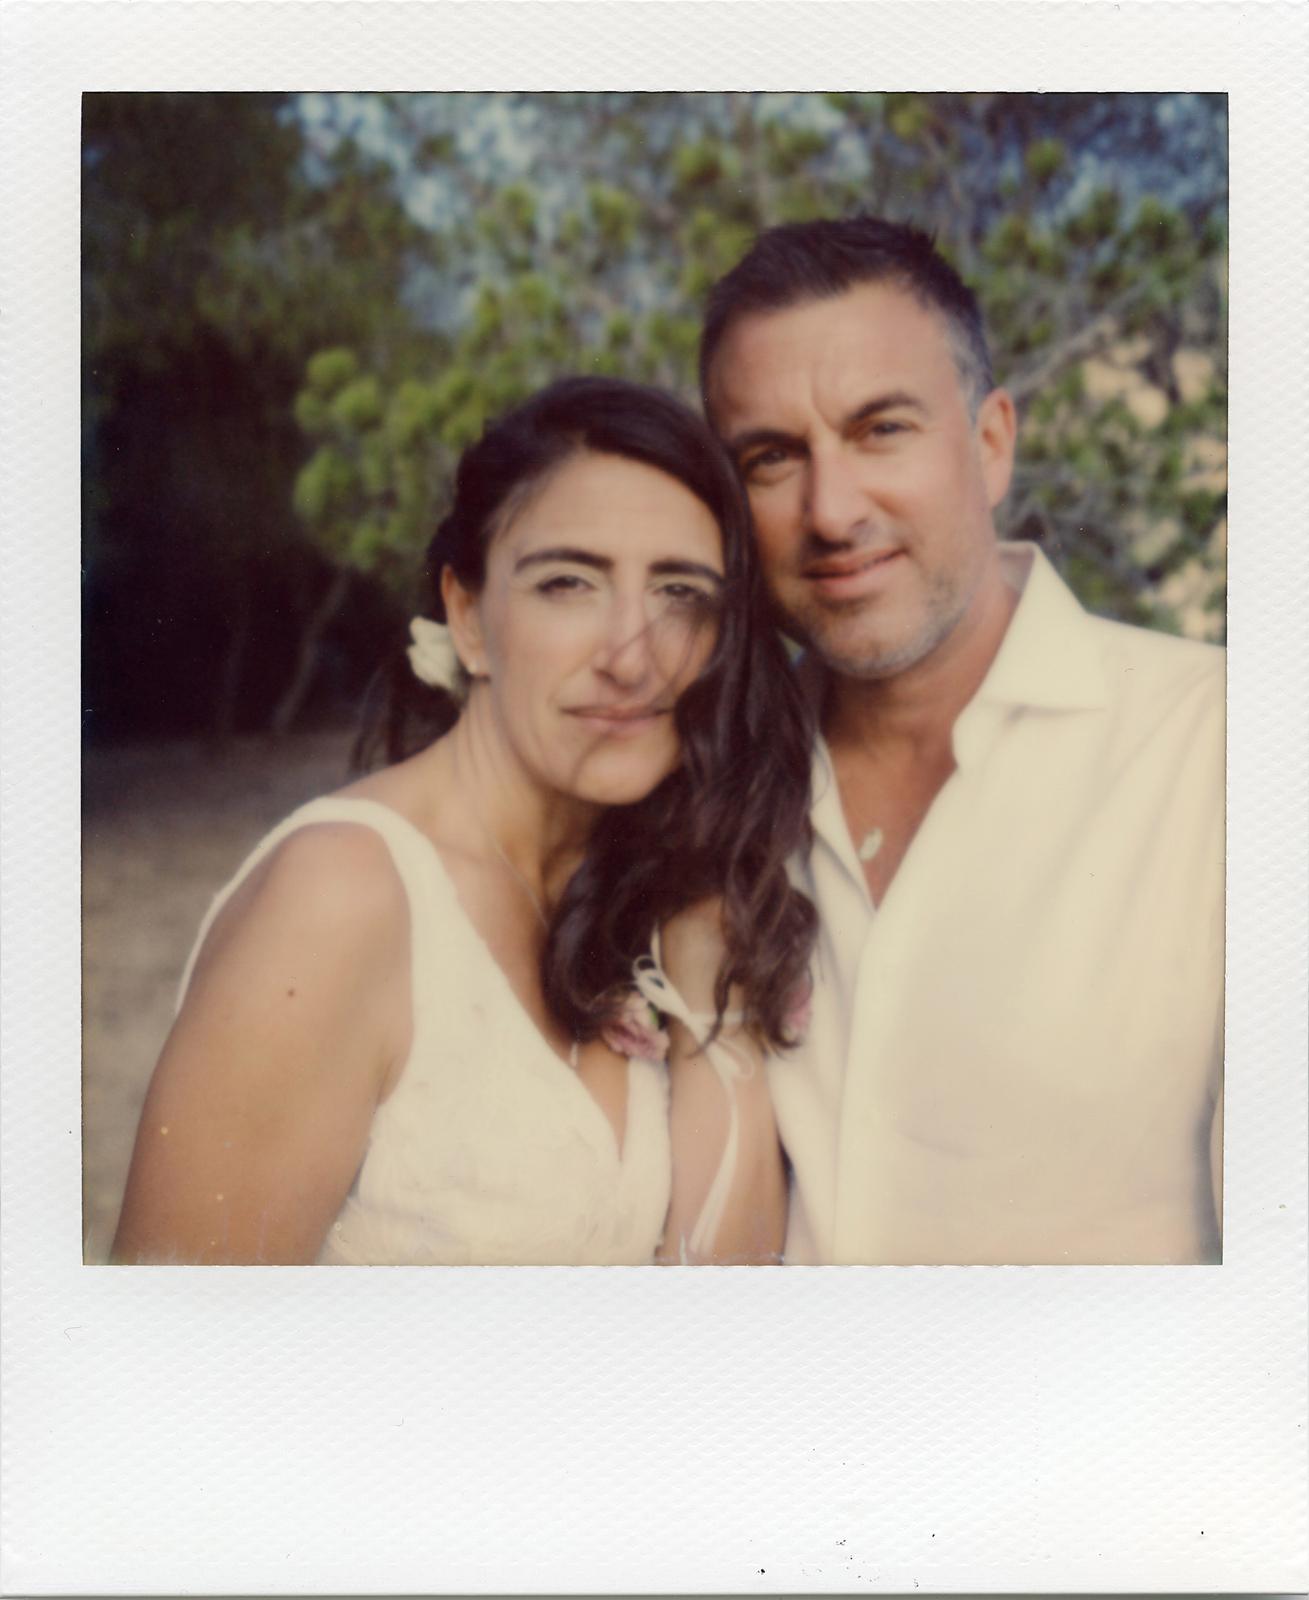 Hochzeitsfotograf_Ibiza_106.jpg